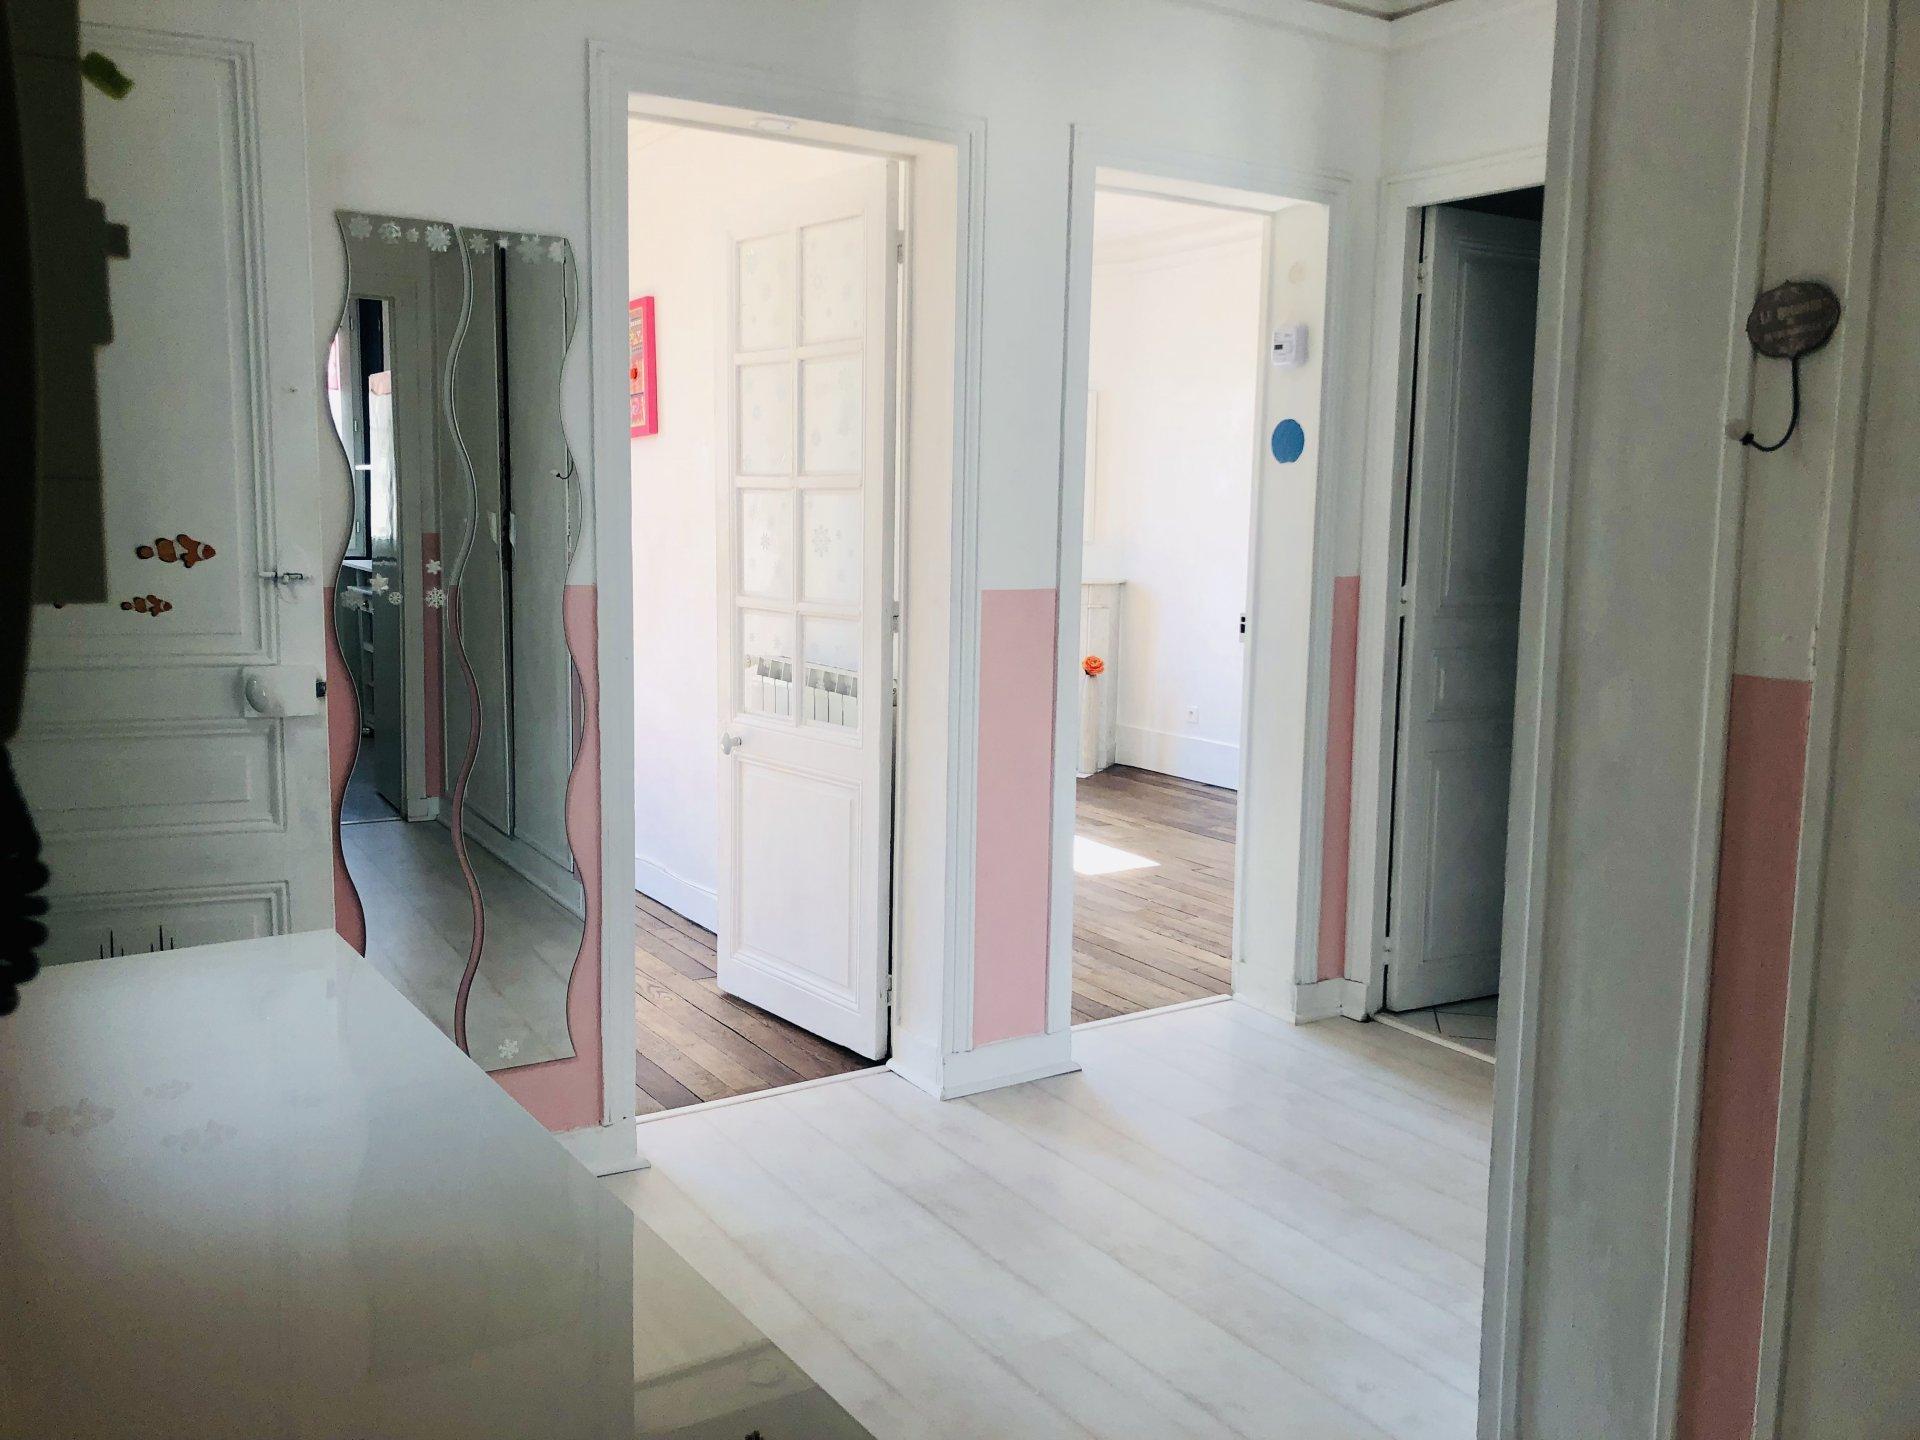 Asnieres-Courbevoie 3 Pièces - 2 chambres - Gare de BECON